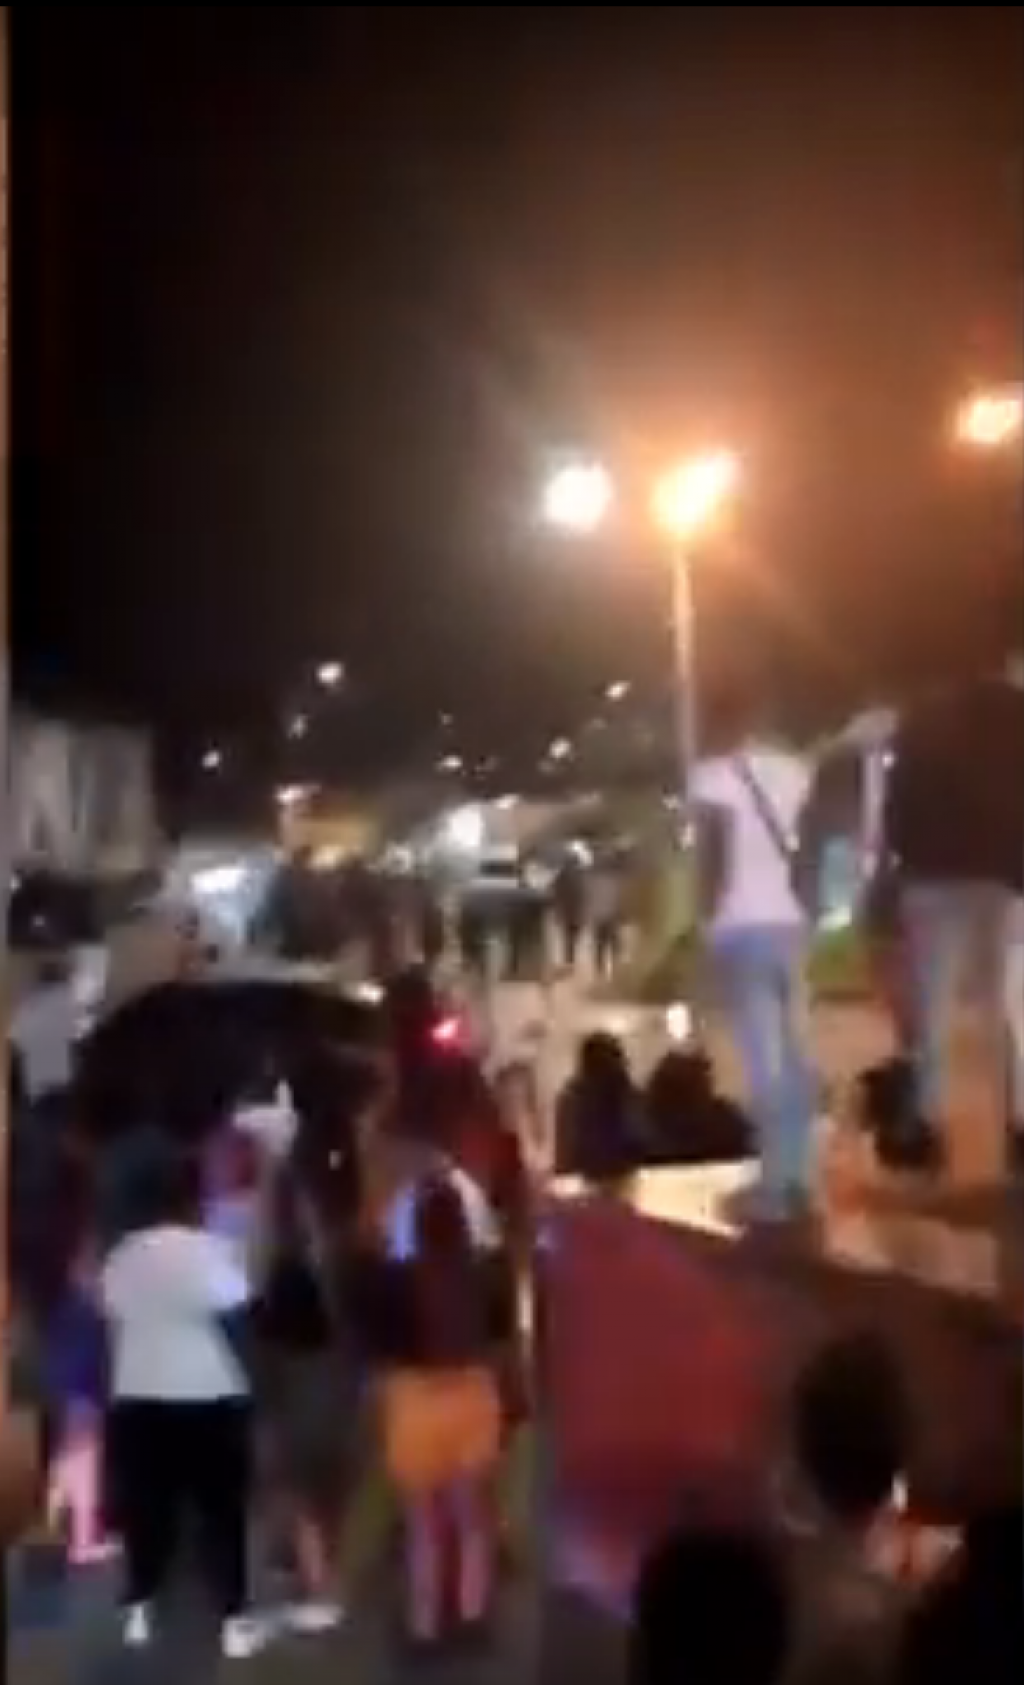 VIDEO: Campus shooting under investigation